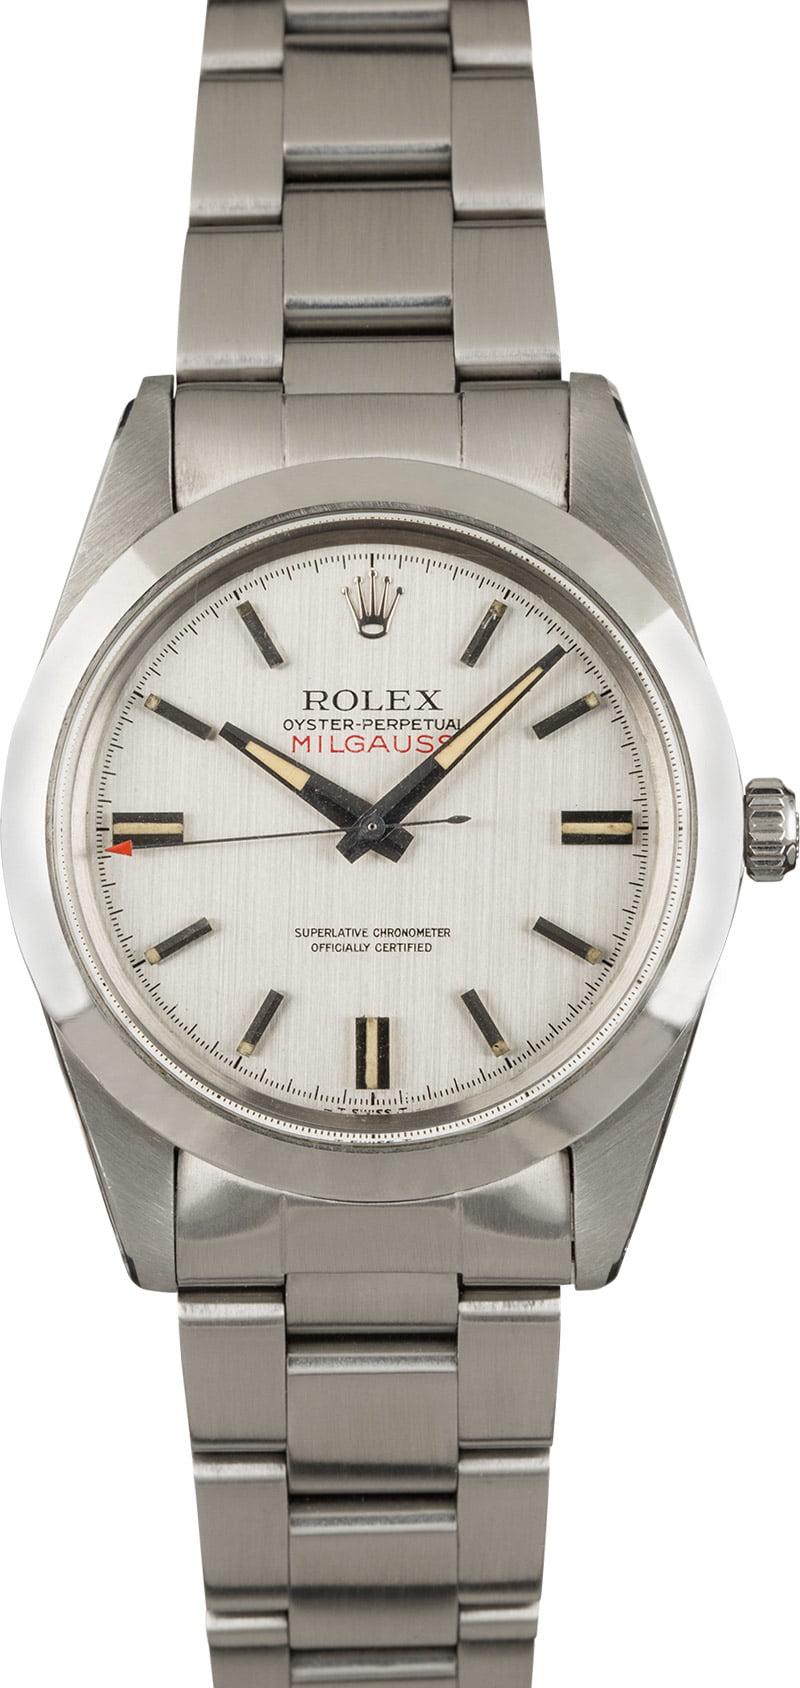 Vintage 1968 Rolex Milgauss 1019